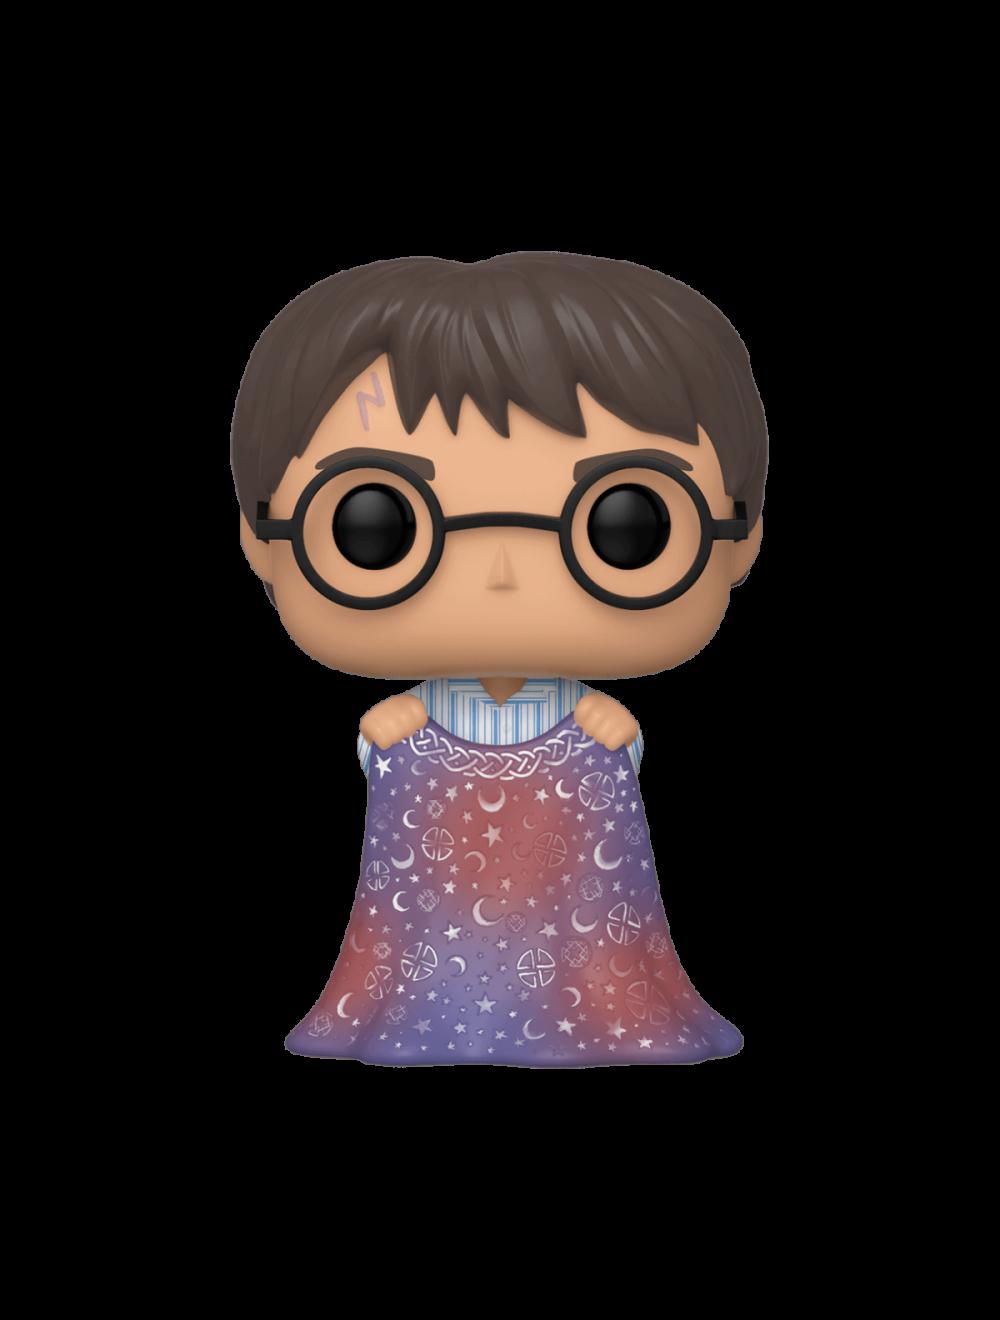 Funko POP! Harry Potter - Harry Invisibility Cloak Vinyl Figura 10cm